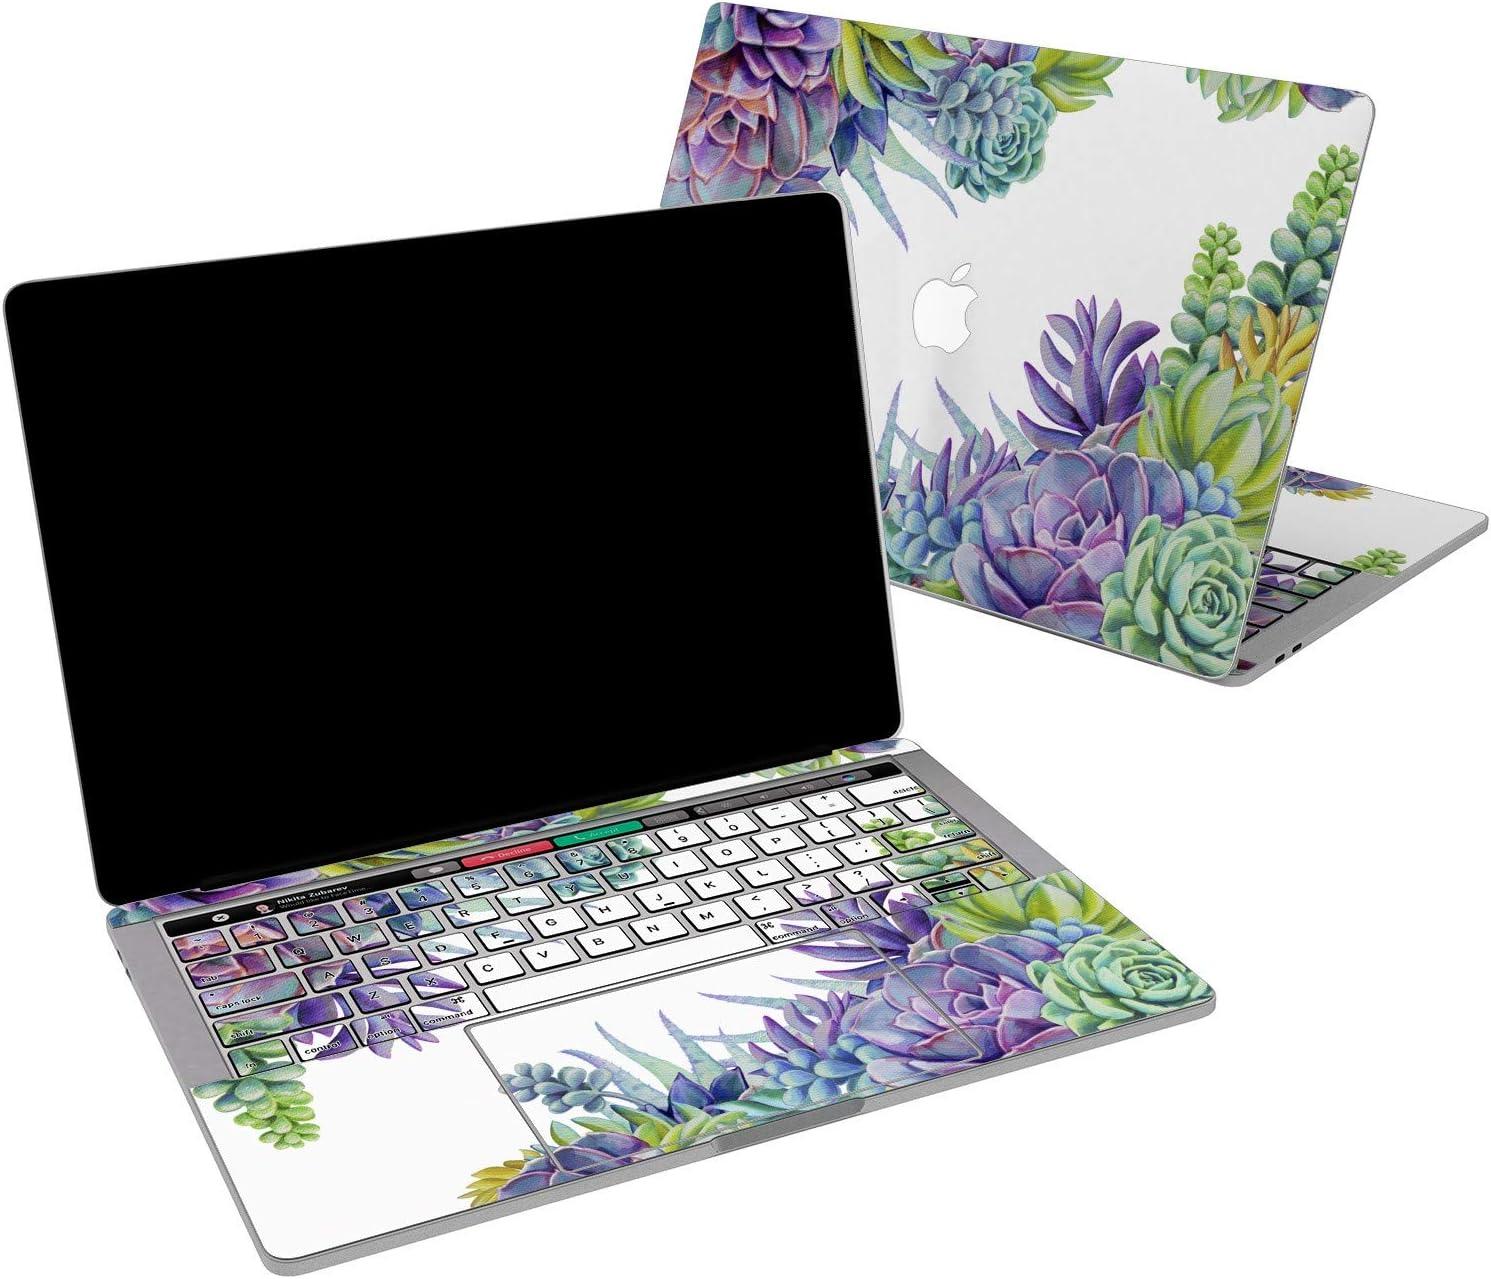 Lex Altern Vinyl Skin for MacBook Air 13 inch Mac Pro 16 15 Retina 12 11 2020 2019 2018 2017 Succulent Flowers Purple Floral Cactus Stylish Print Laptop Cover Keyboard Decal Sticker Design Top